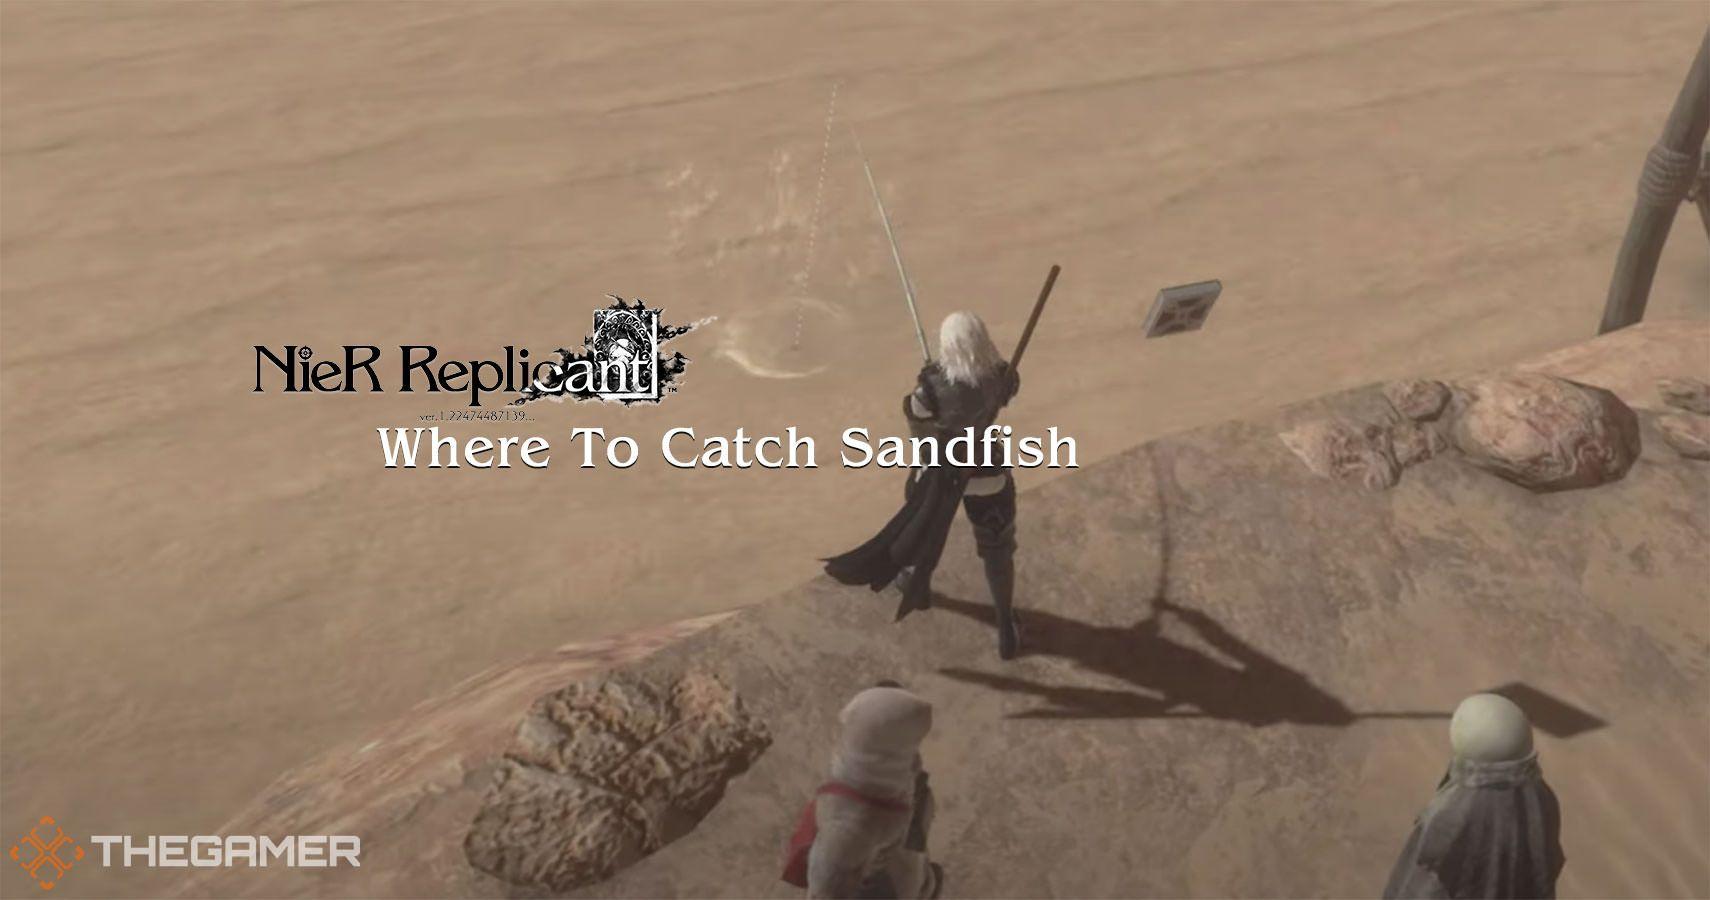 Nier Replicant: Where To Catch Sandfish